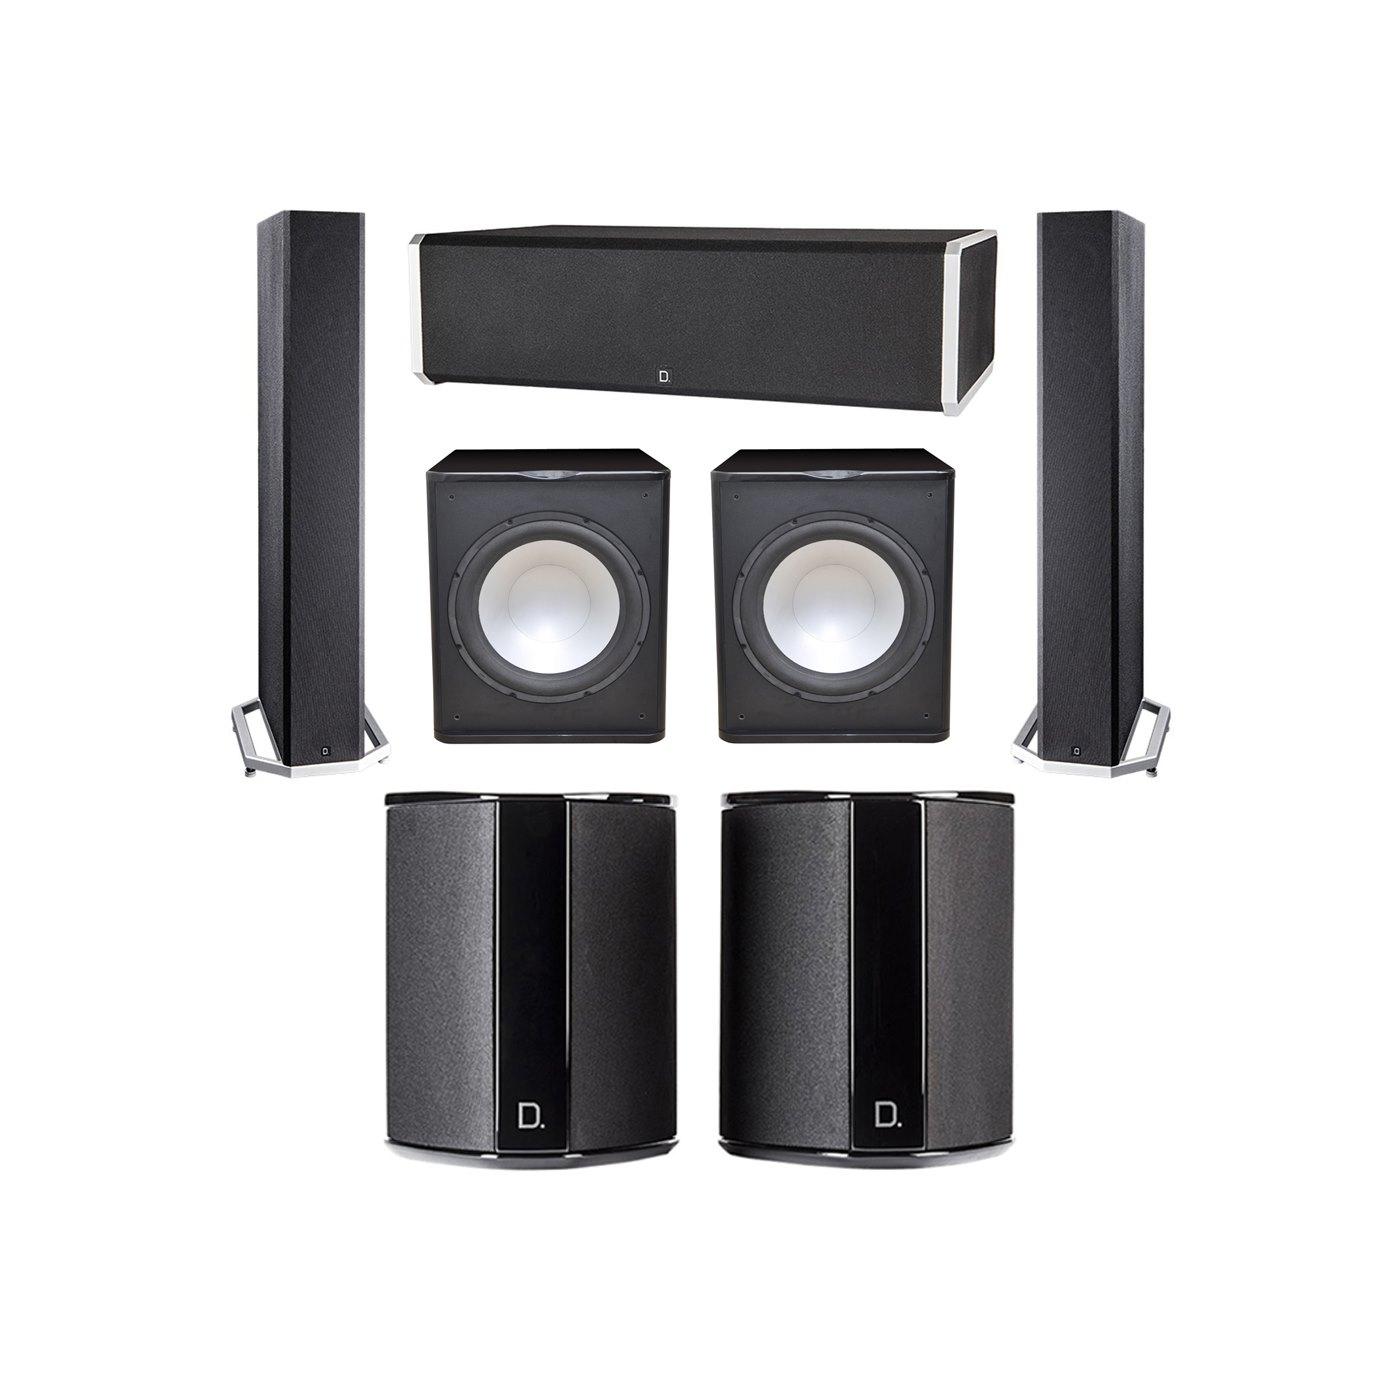 Definitive Technology 5.2 System with 2 BP9040 Tower Speakers, 1 CS9060 Center Channel Speaker, 2 SR9040 Surround Speaker, 2 Premier Acoustic PA-150 Subwoofer